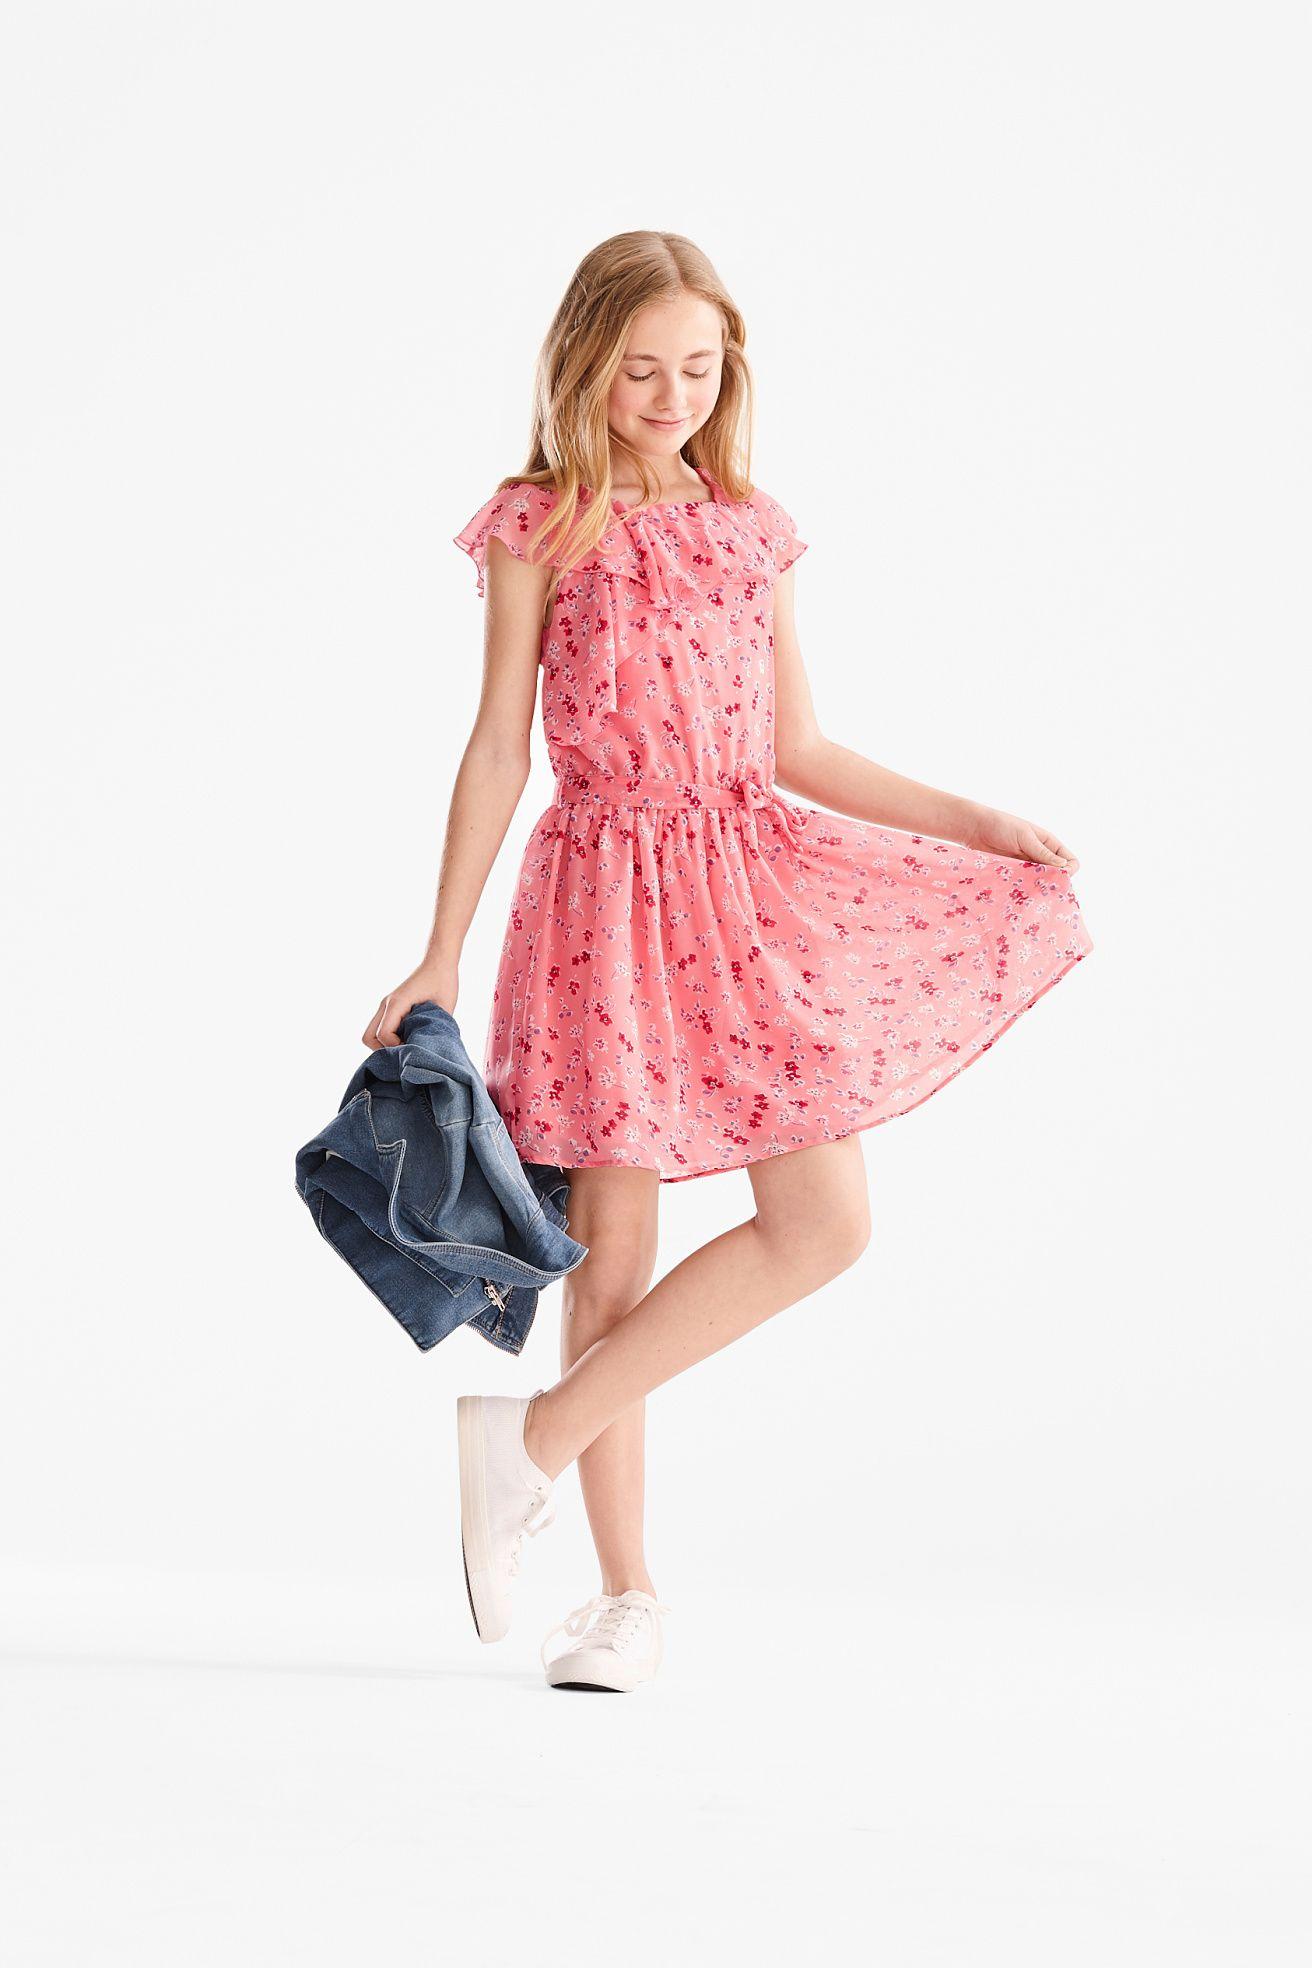 Chiffonjurk Chiffonkleid Sommerkleid Chiffon Kleid